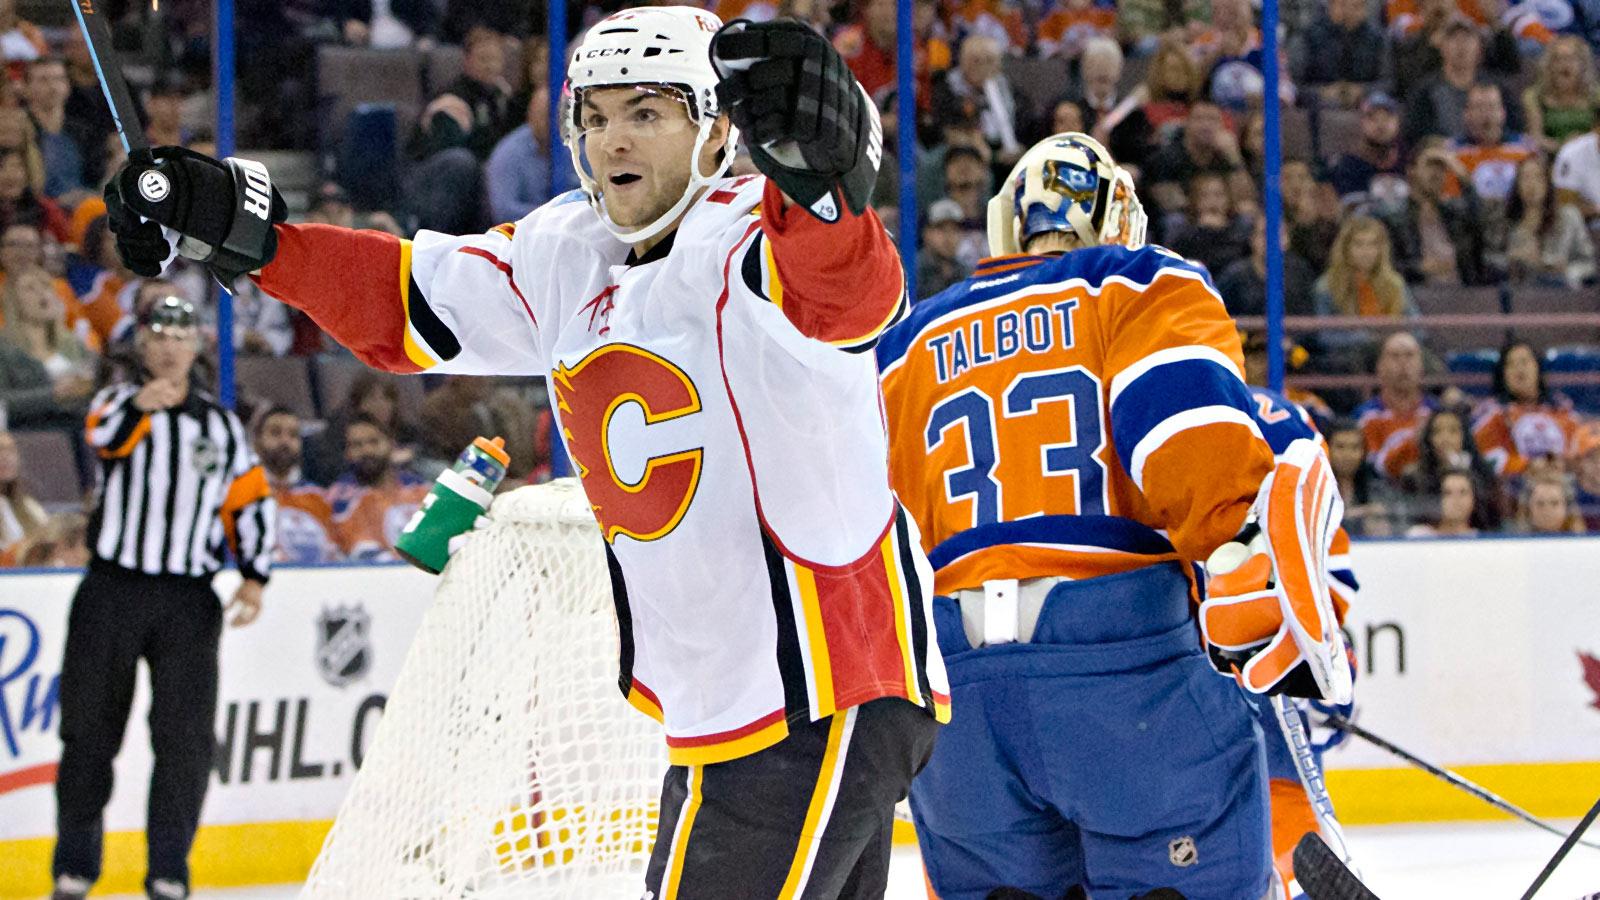 Frolik caps hat trick in last seconds, Flames edge Oilers to snap skid